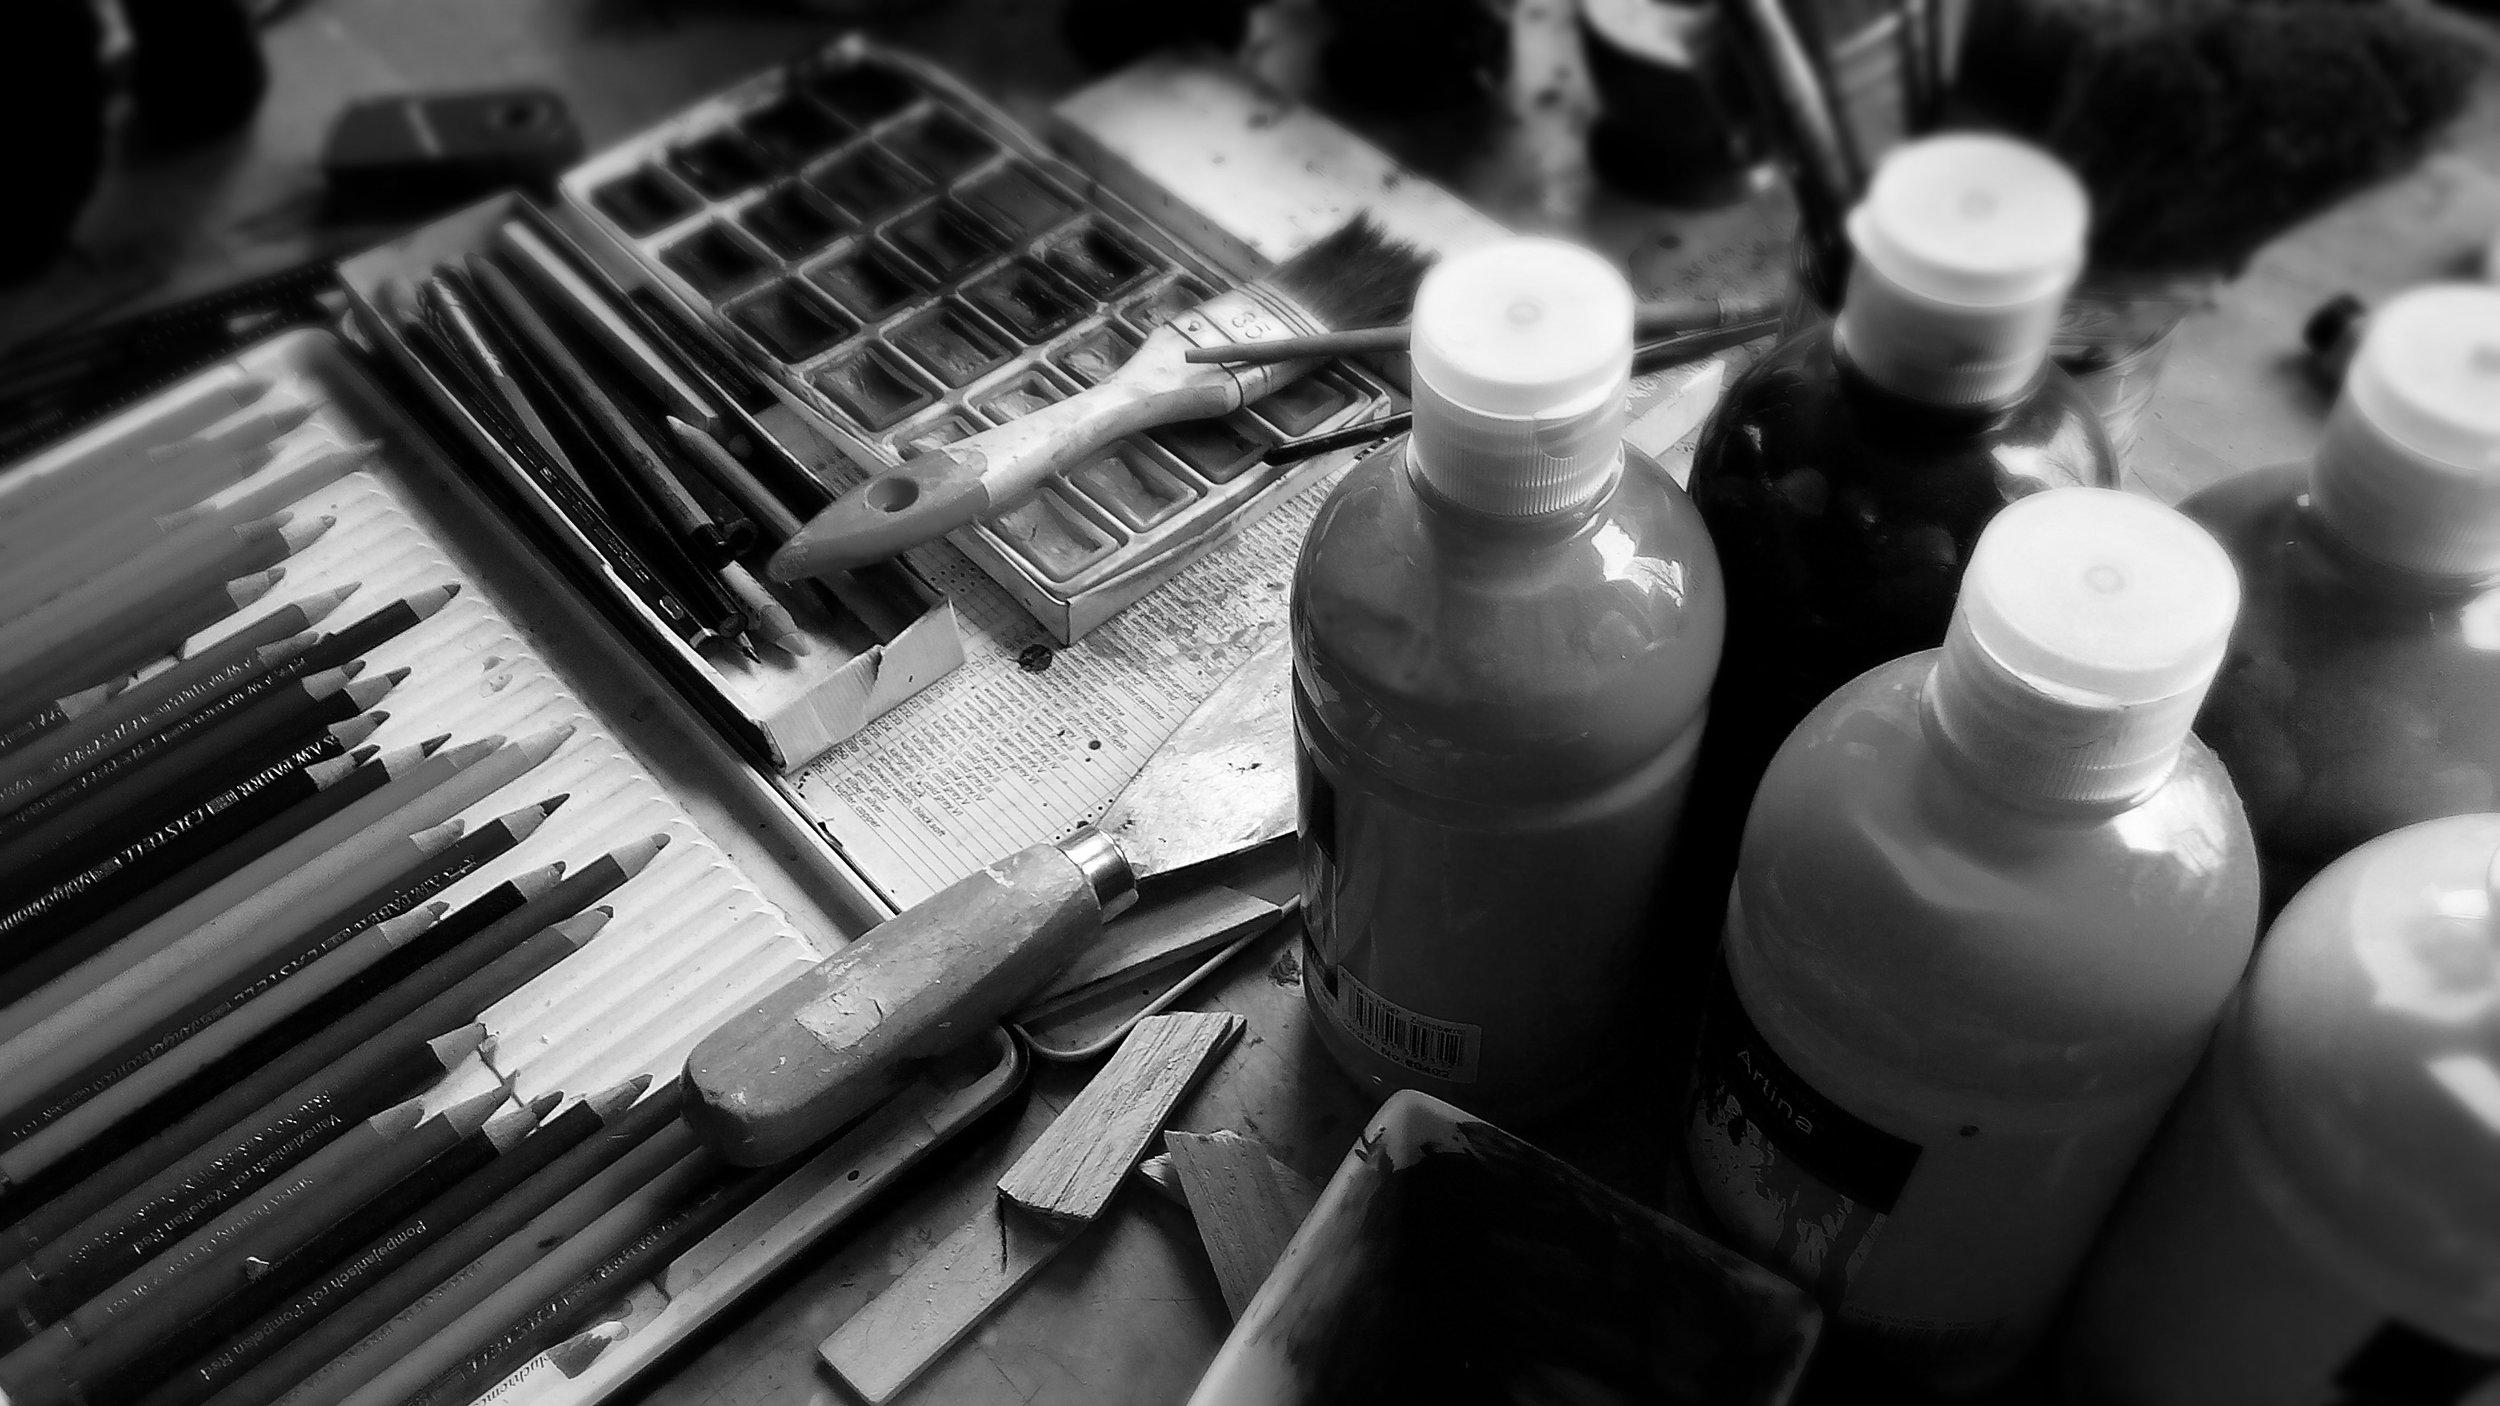 painting-911804 - black and white.jpg